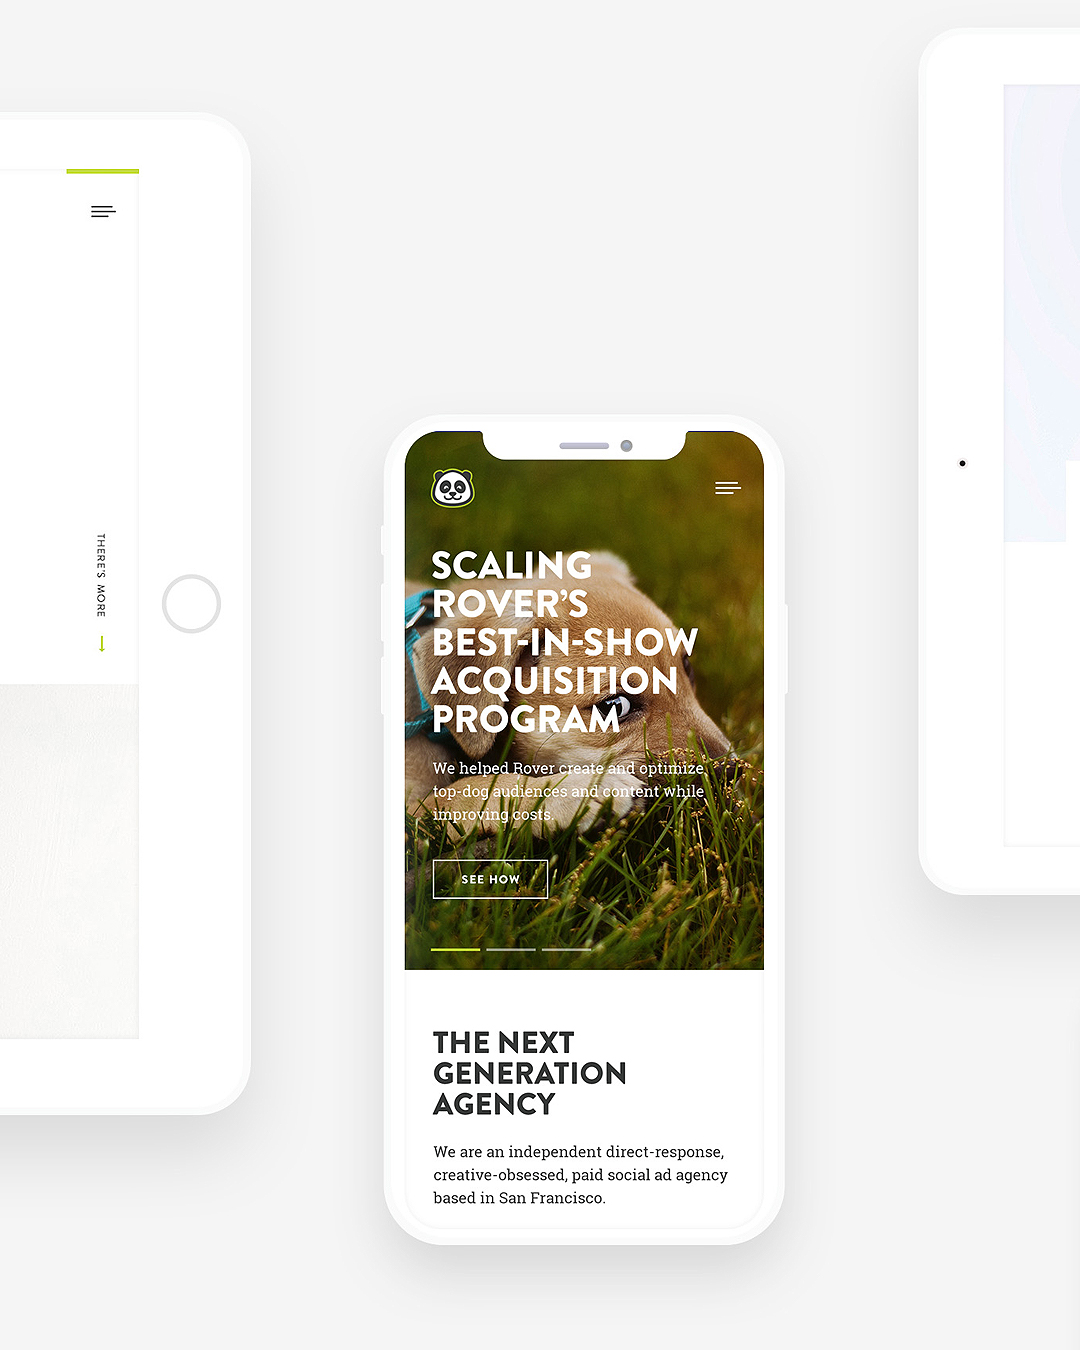 Bamboo - Brand / Digital